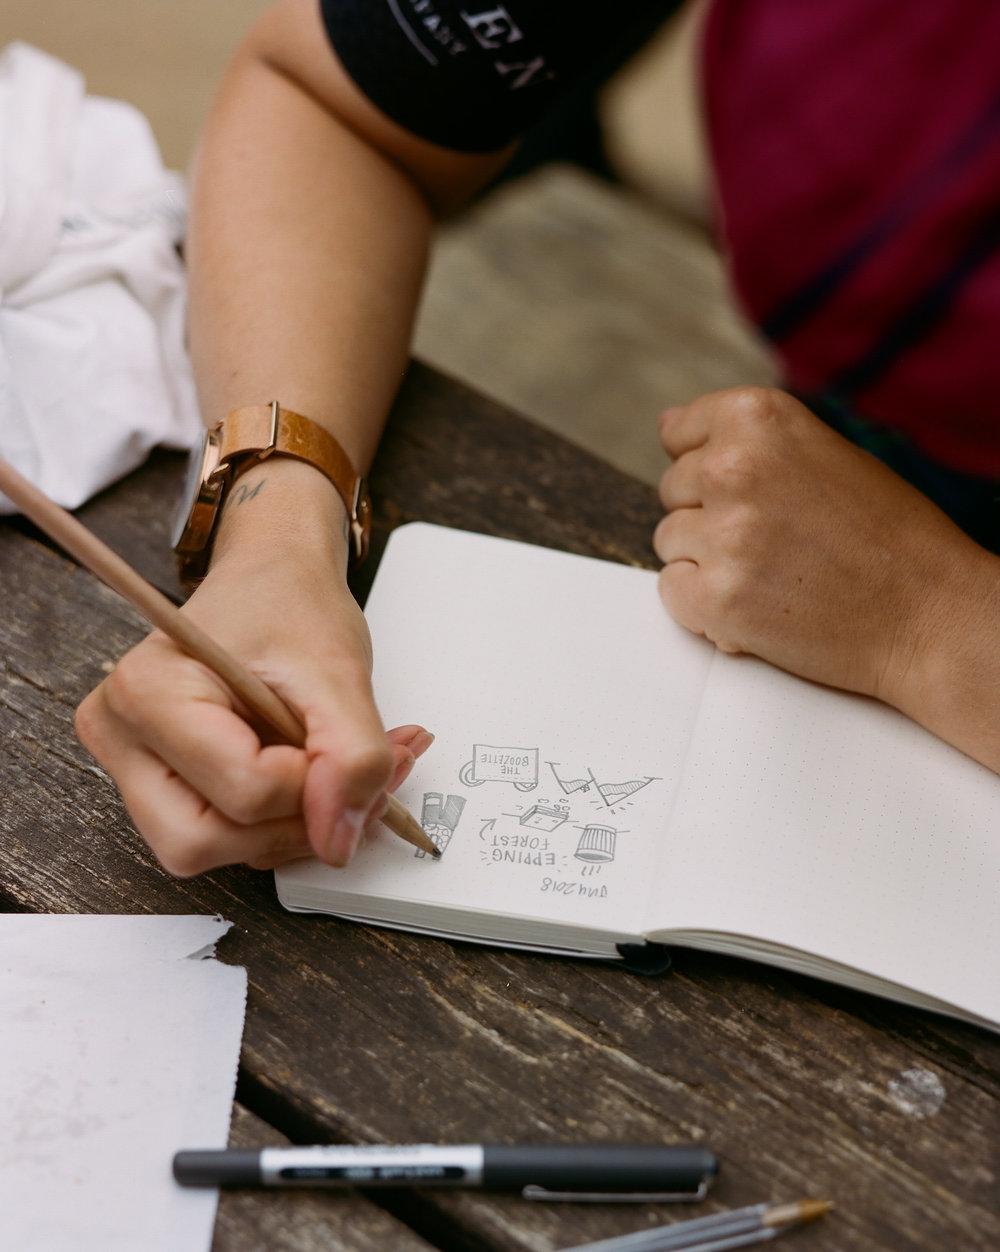 WRITING IN BOOK.jpg